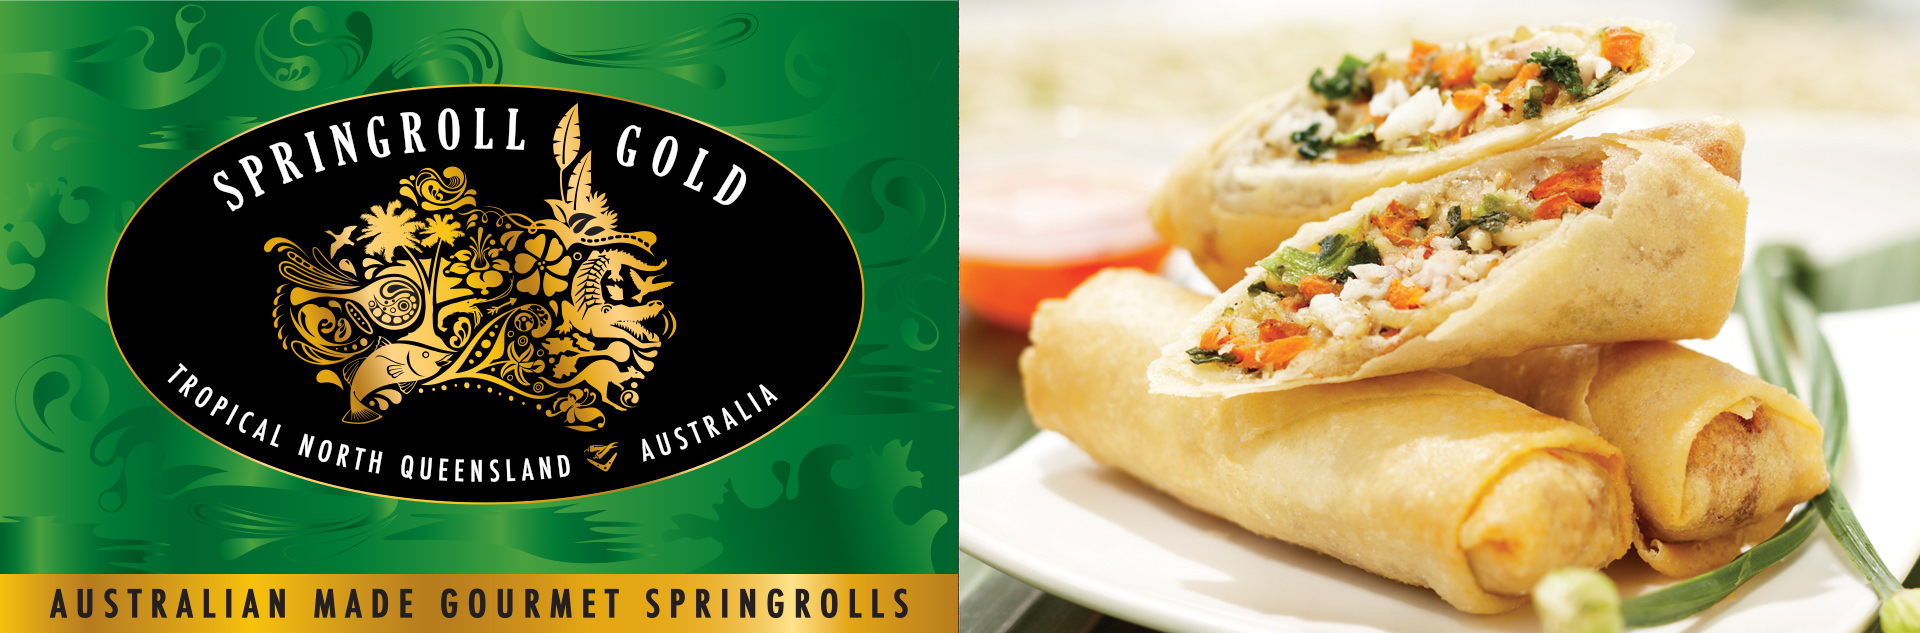 Australian-barramundi-springroll-gold-logo-spring-rolls-home